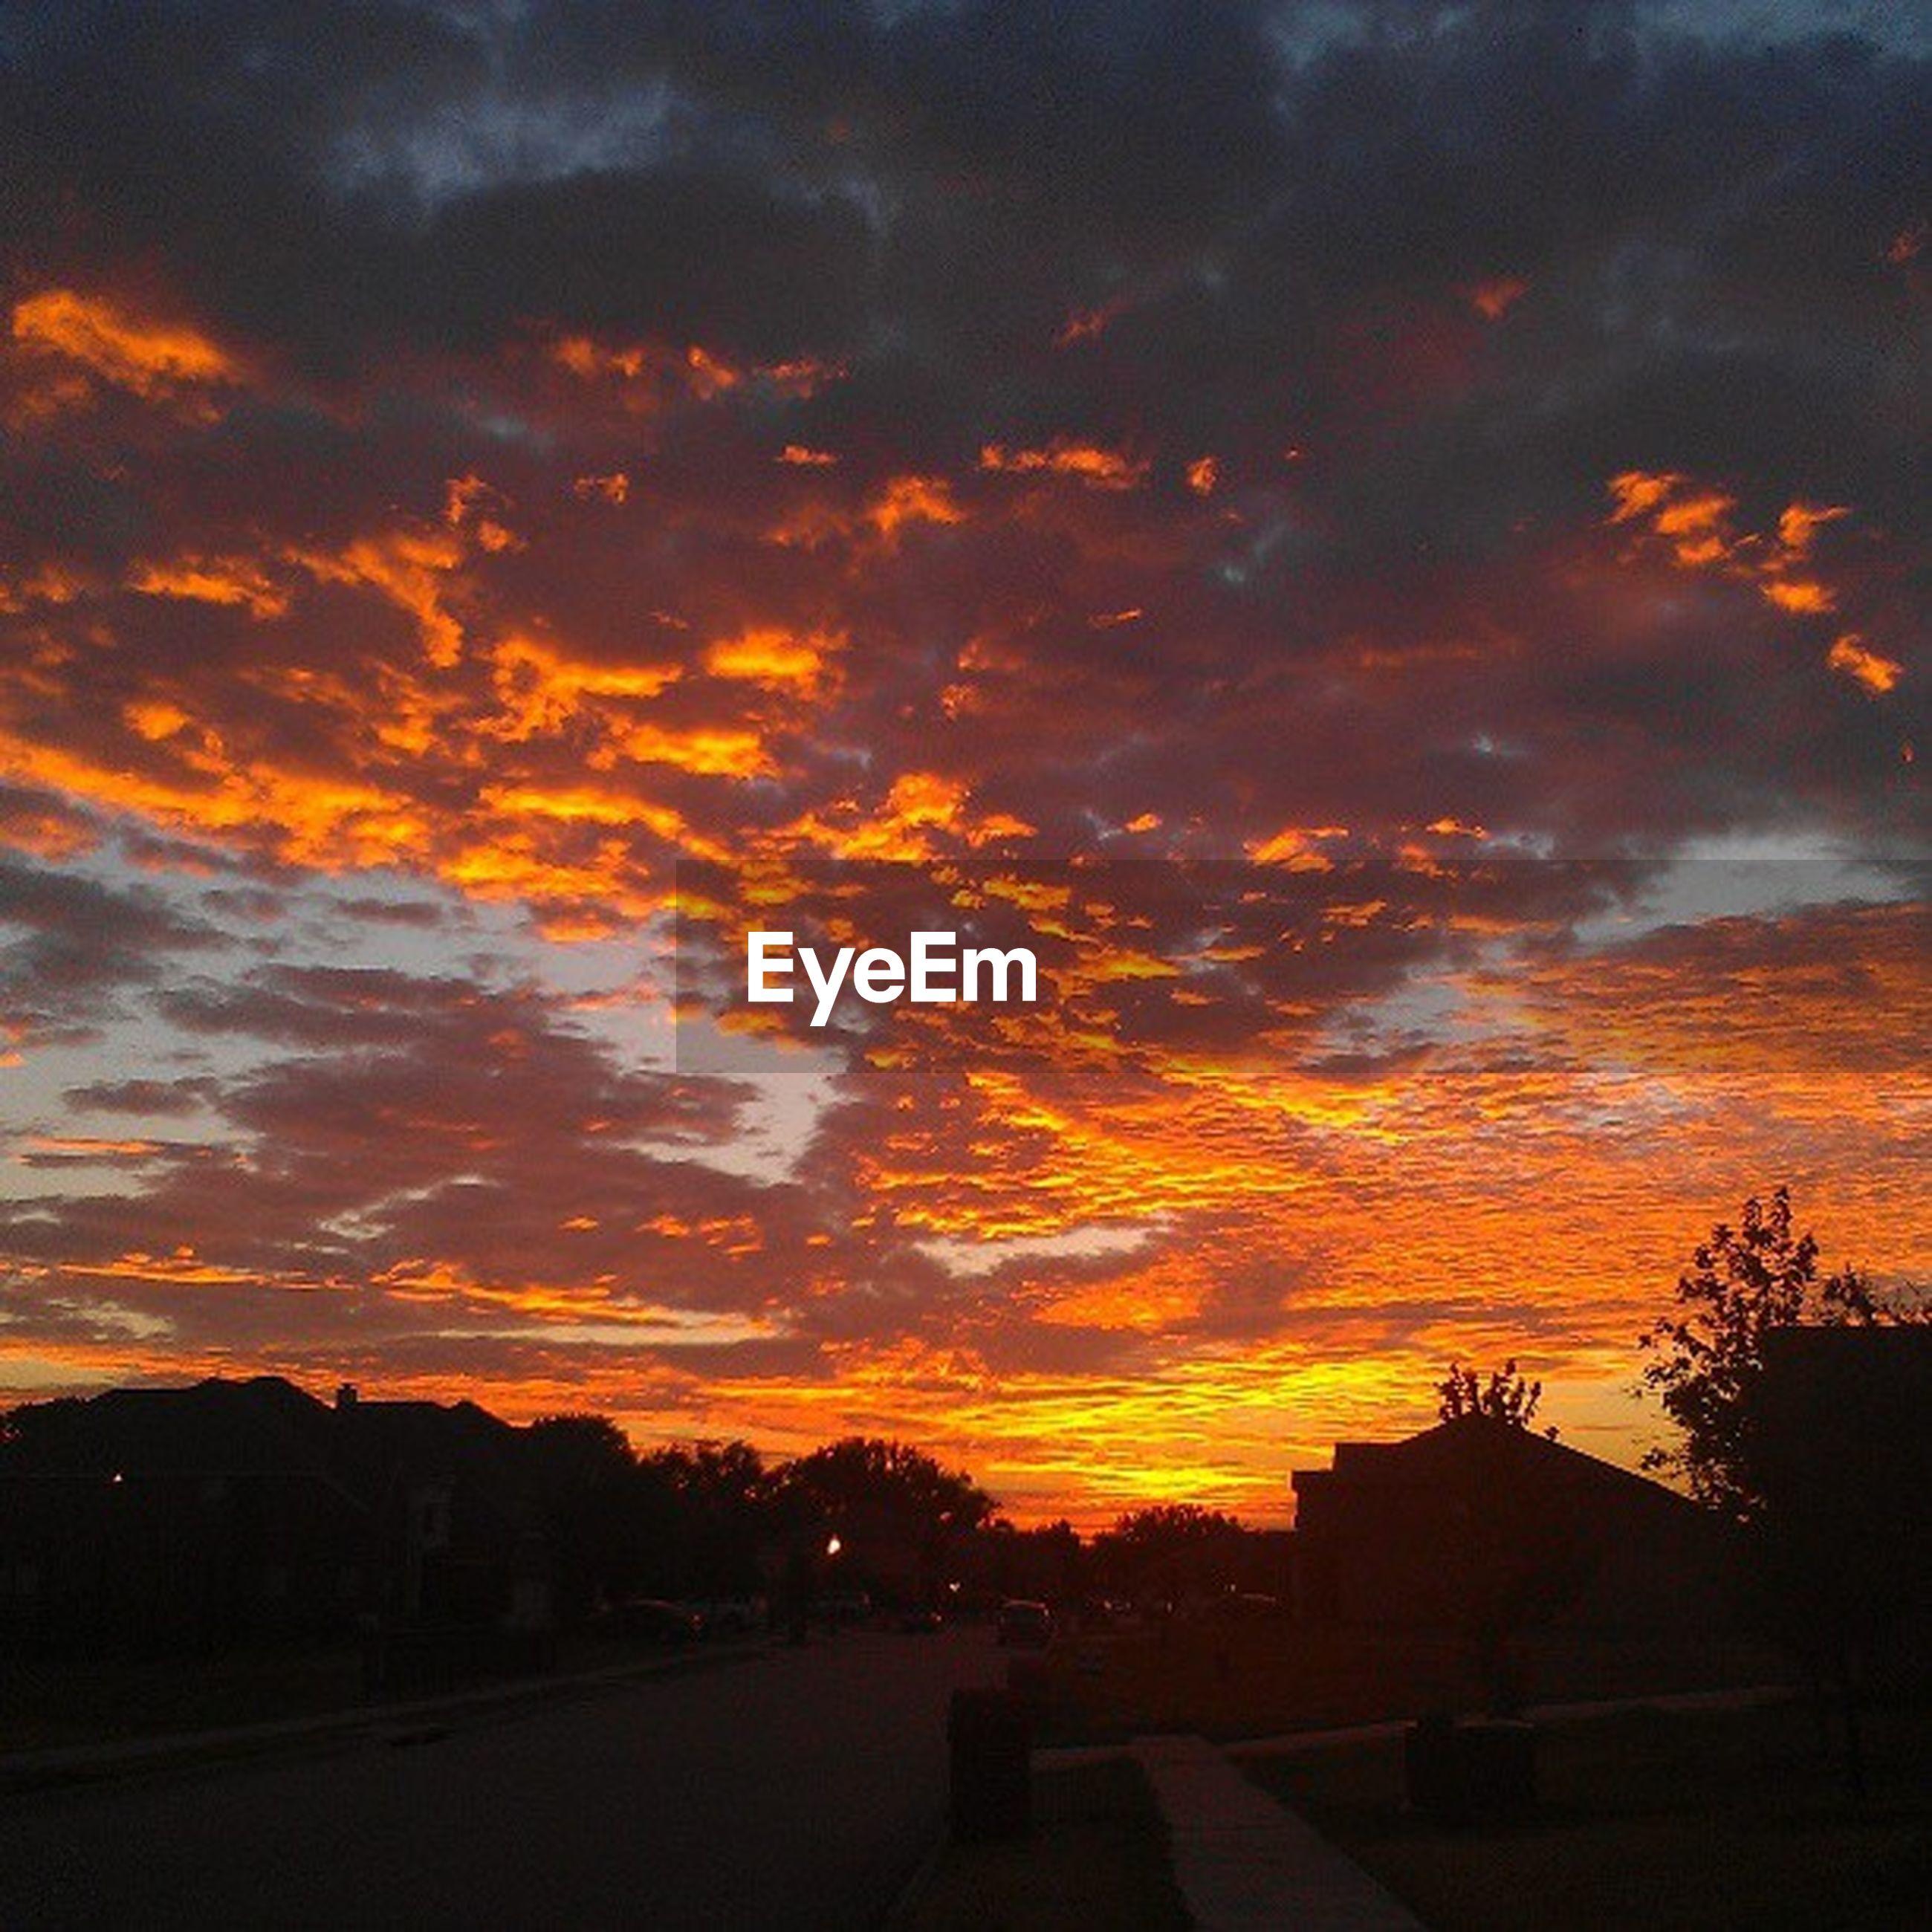 sunset, sky, orange color, cloud - sky, silhouette, dramatic sky, beauty in nature, scenics, cloudy, building exterior, cloud, built structure, tranquil scene, nature, tranquility, architecture, moody sky, road, idyllic, landscape